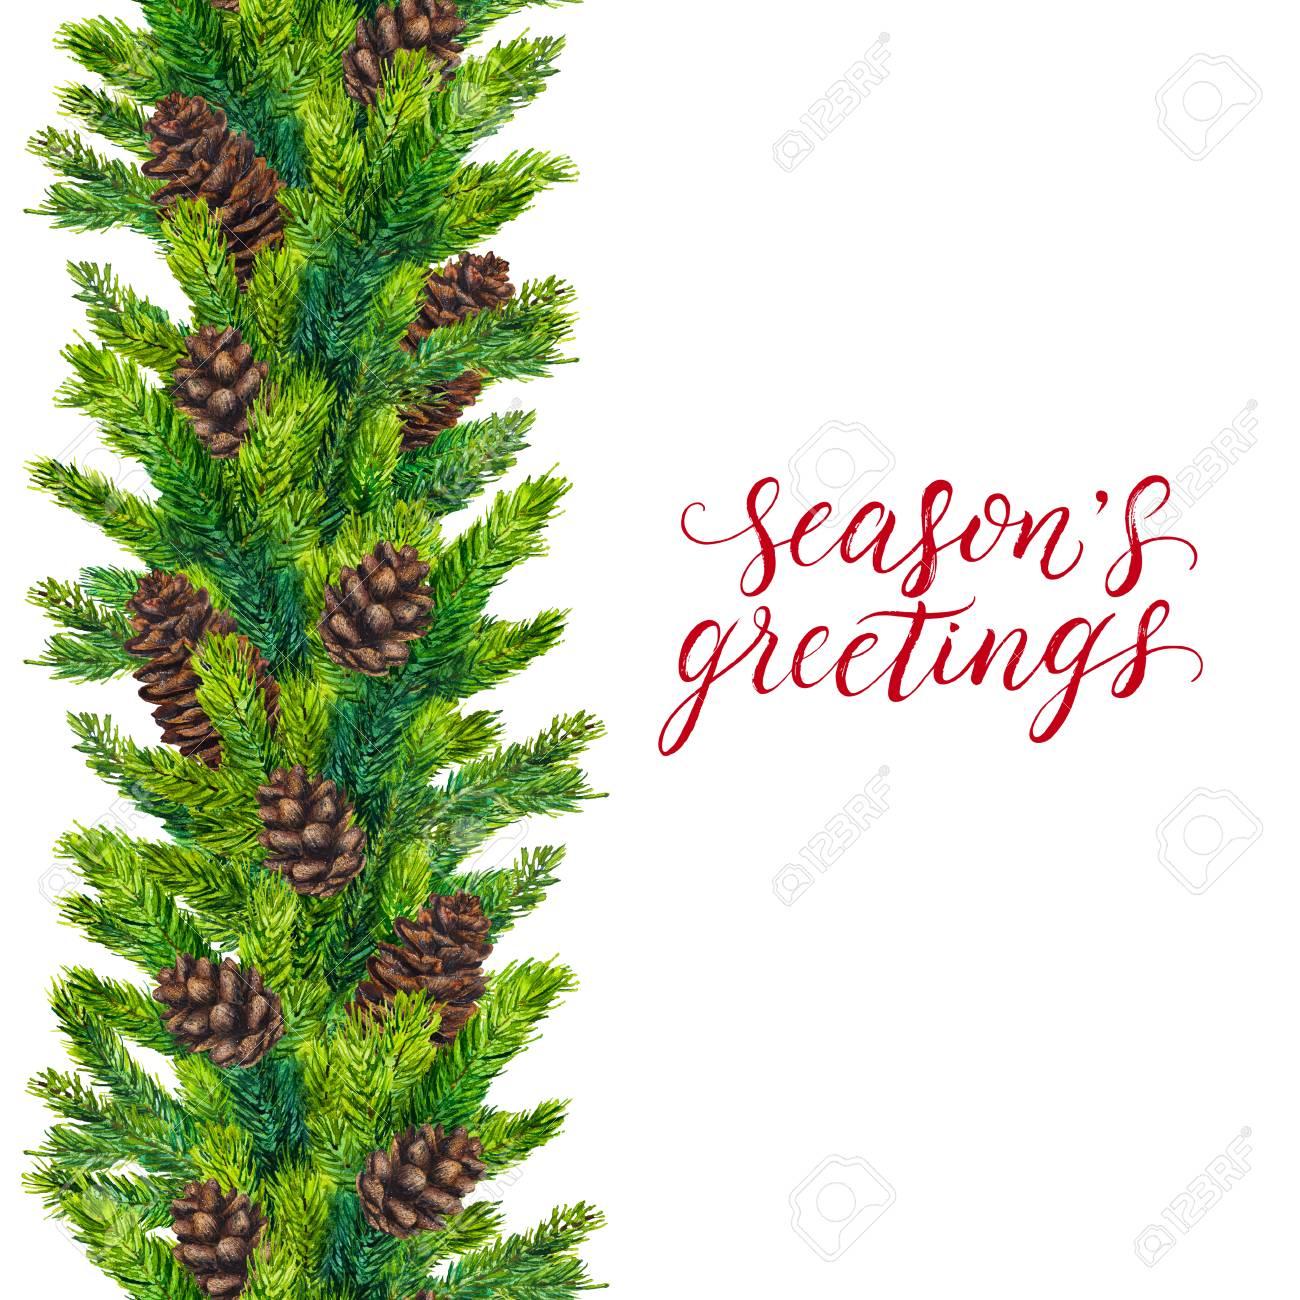 Seasons Greetings Text On Watercolor Christmas Border Of Fir.. Stock ...